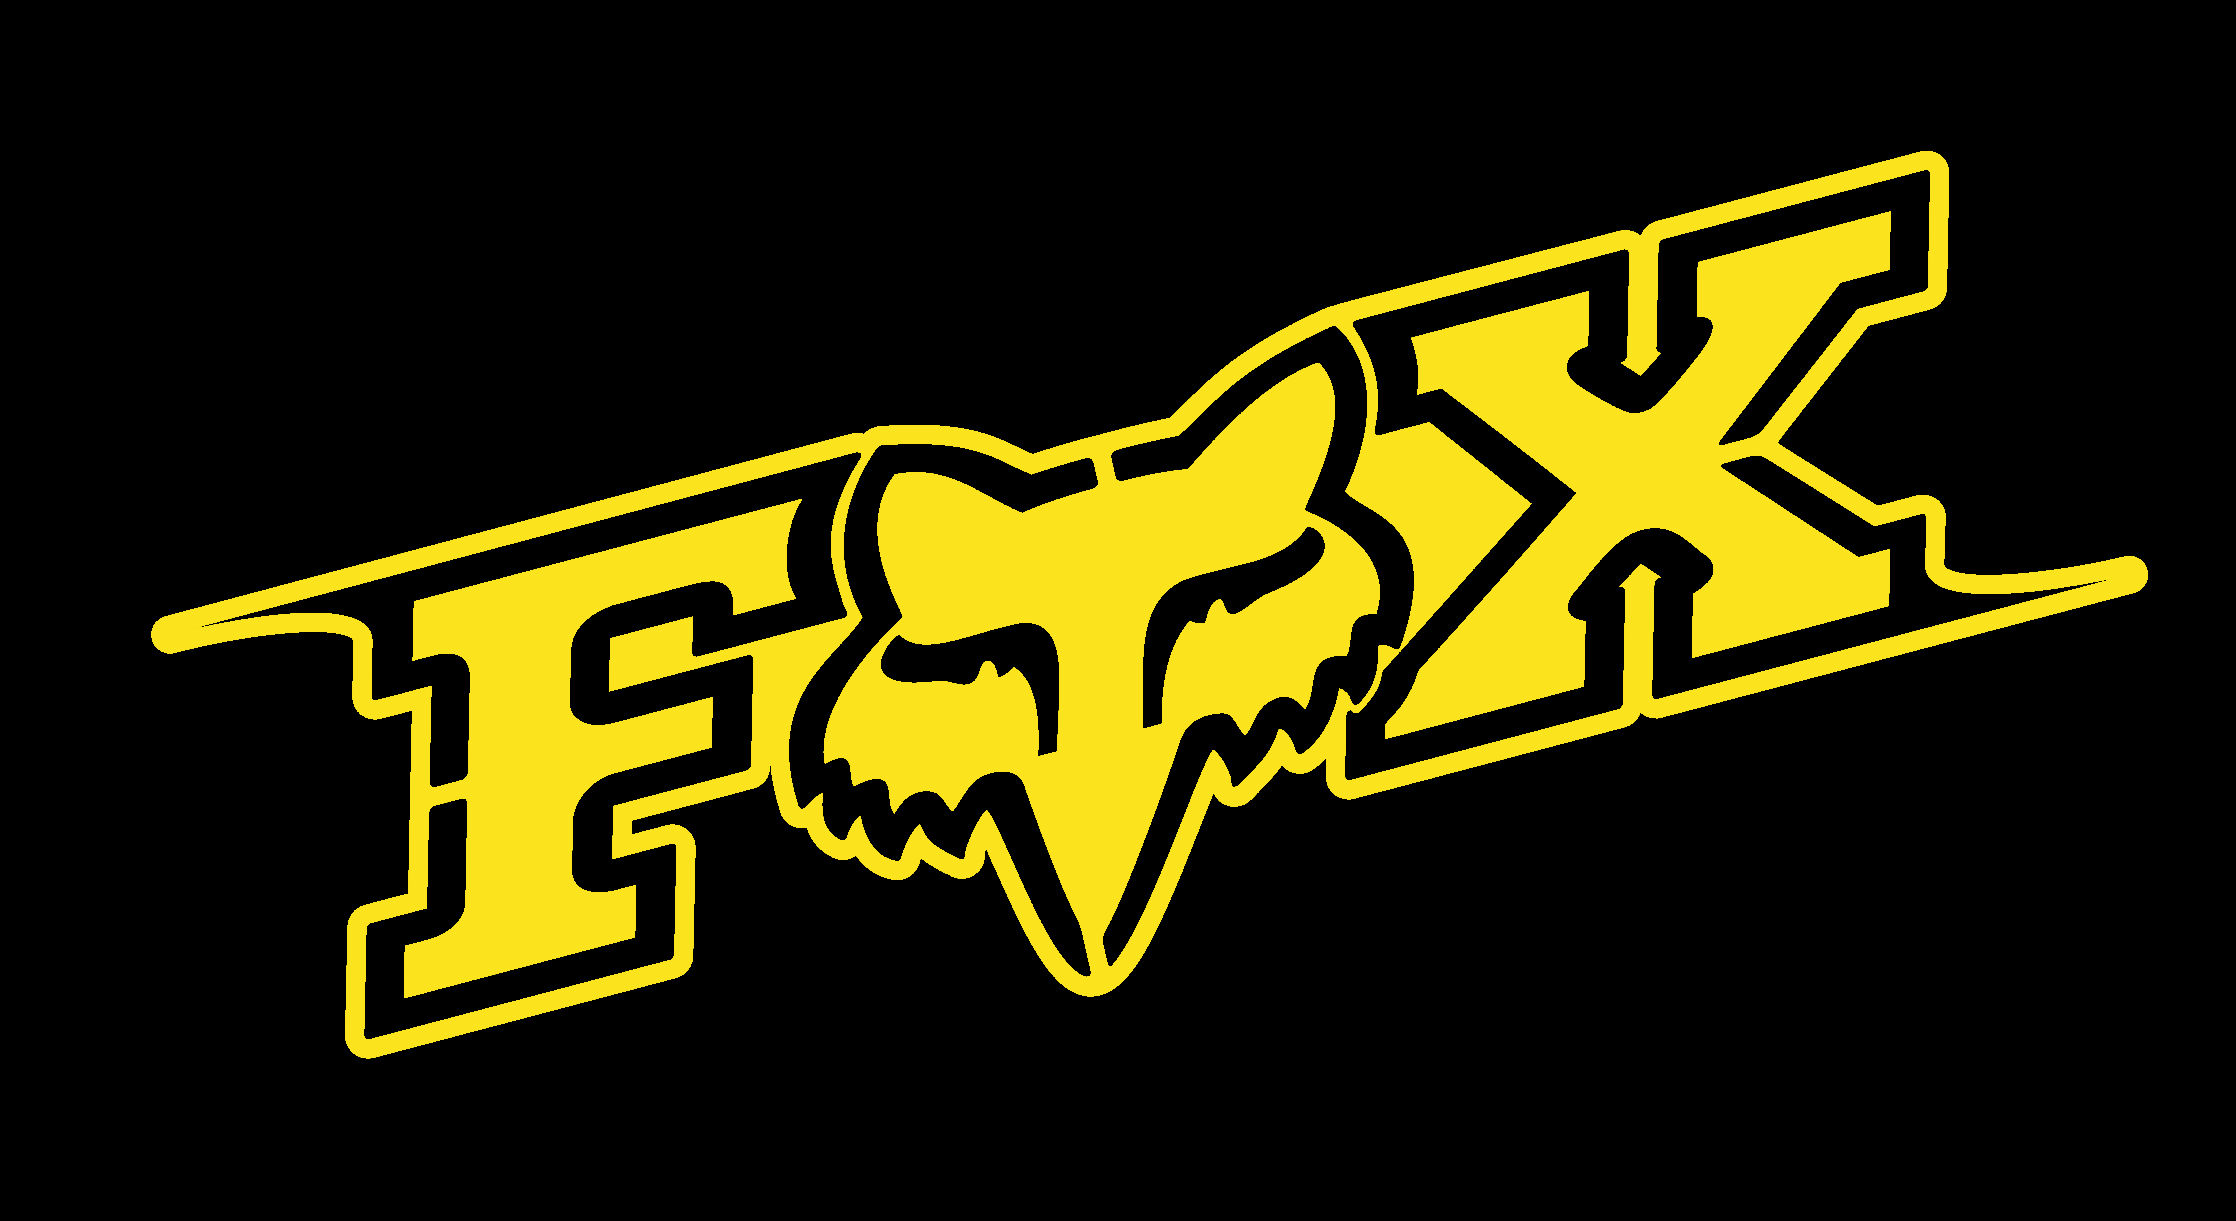 Fox Racing Wallpaper 806838 2236x1221px 2236x1221